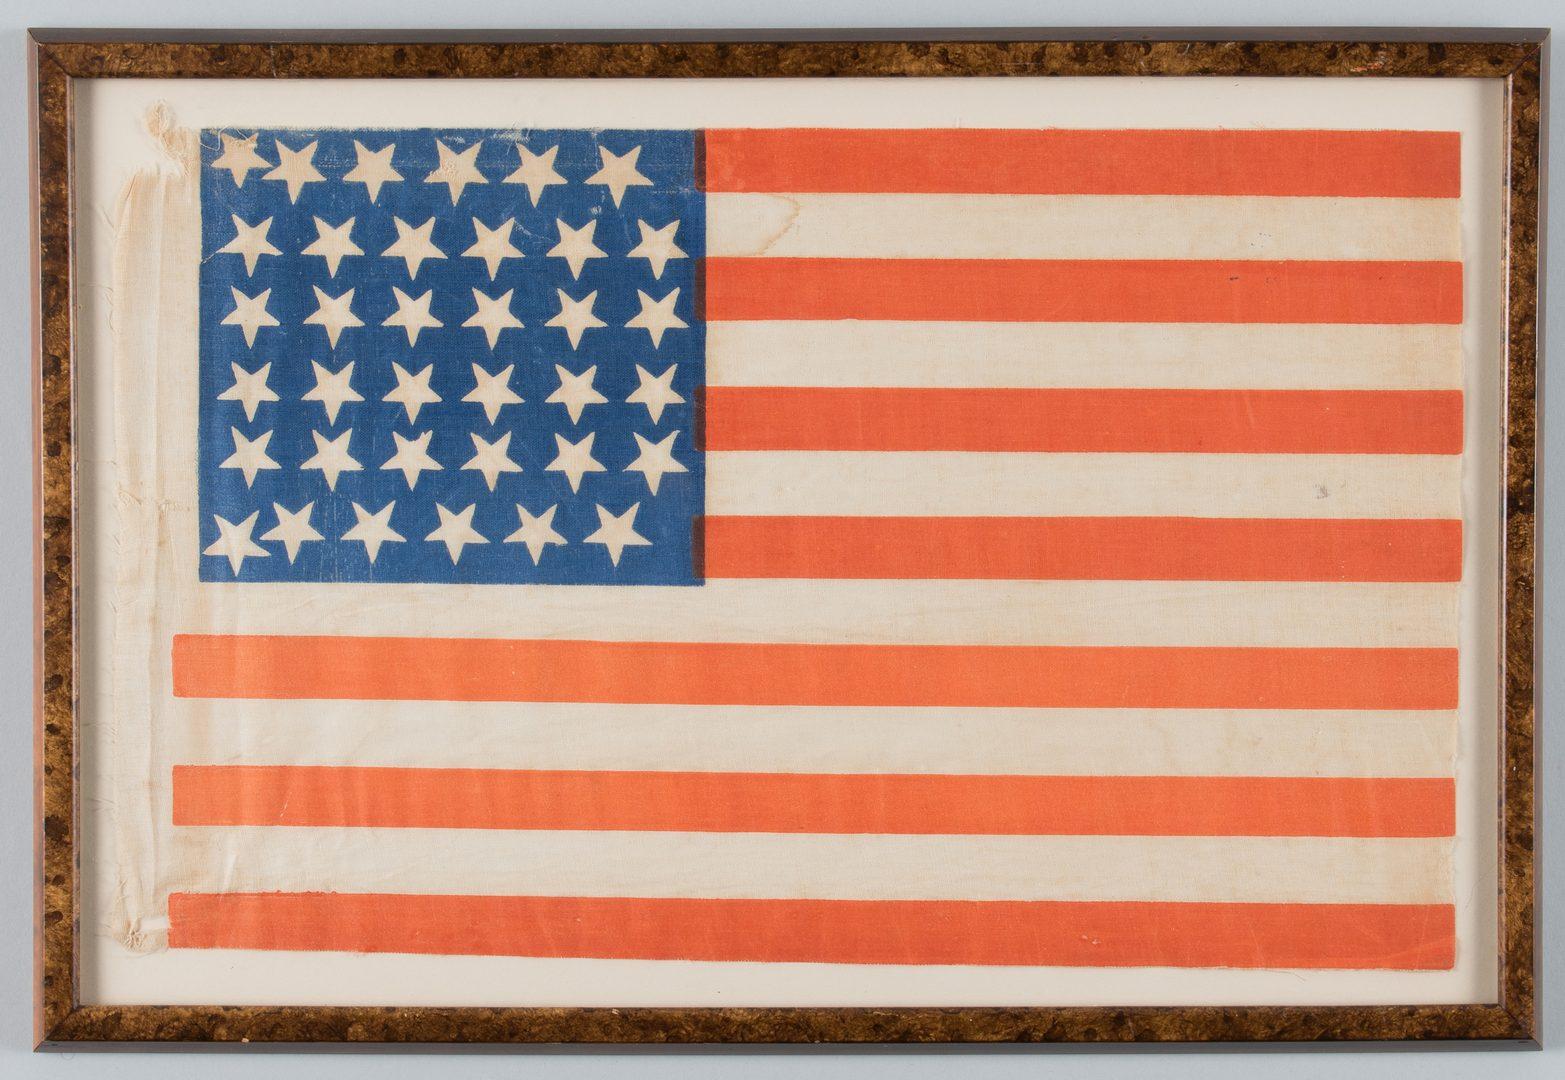 Lot 215: 36 star Parade Flag